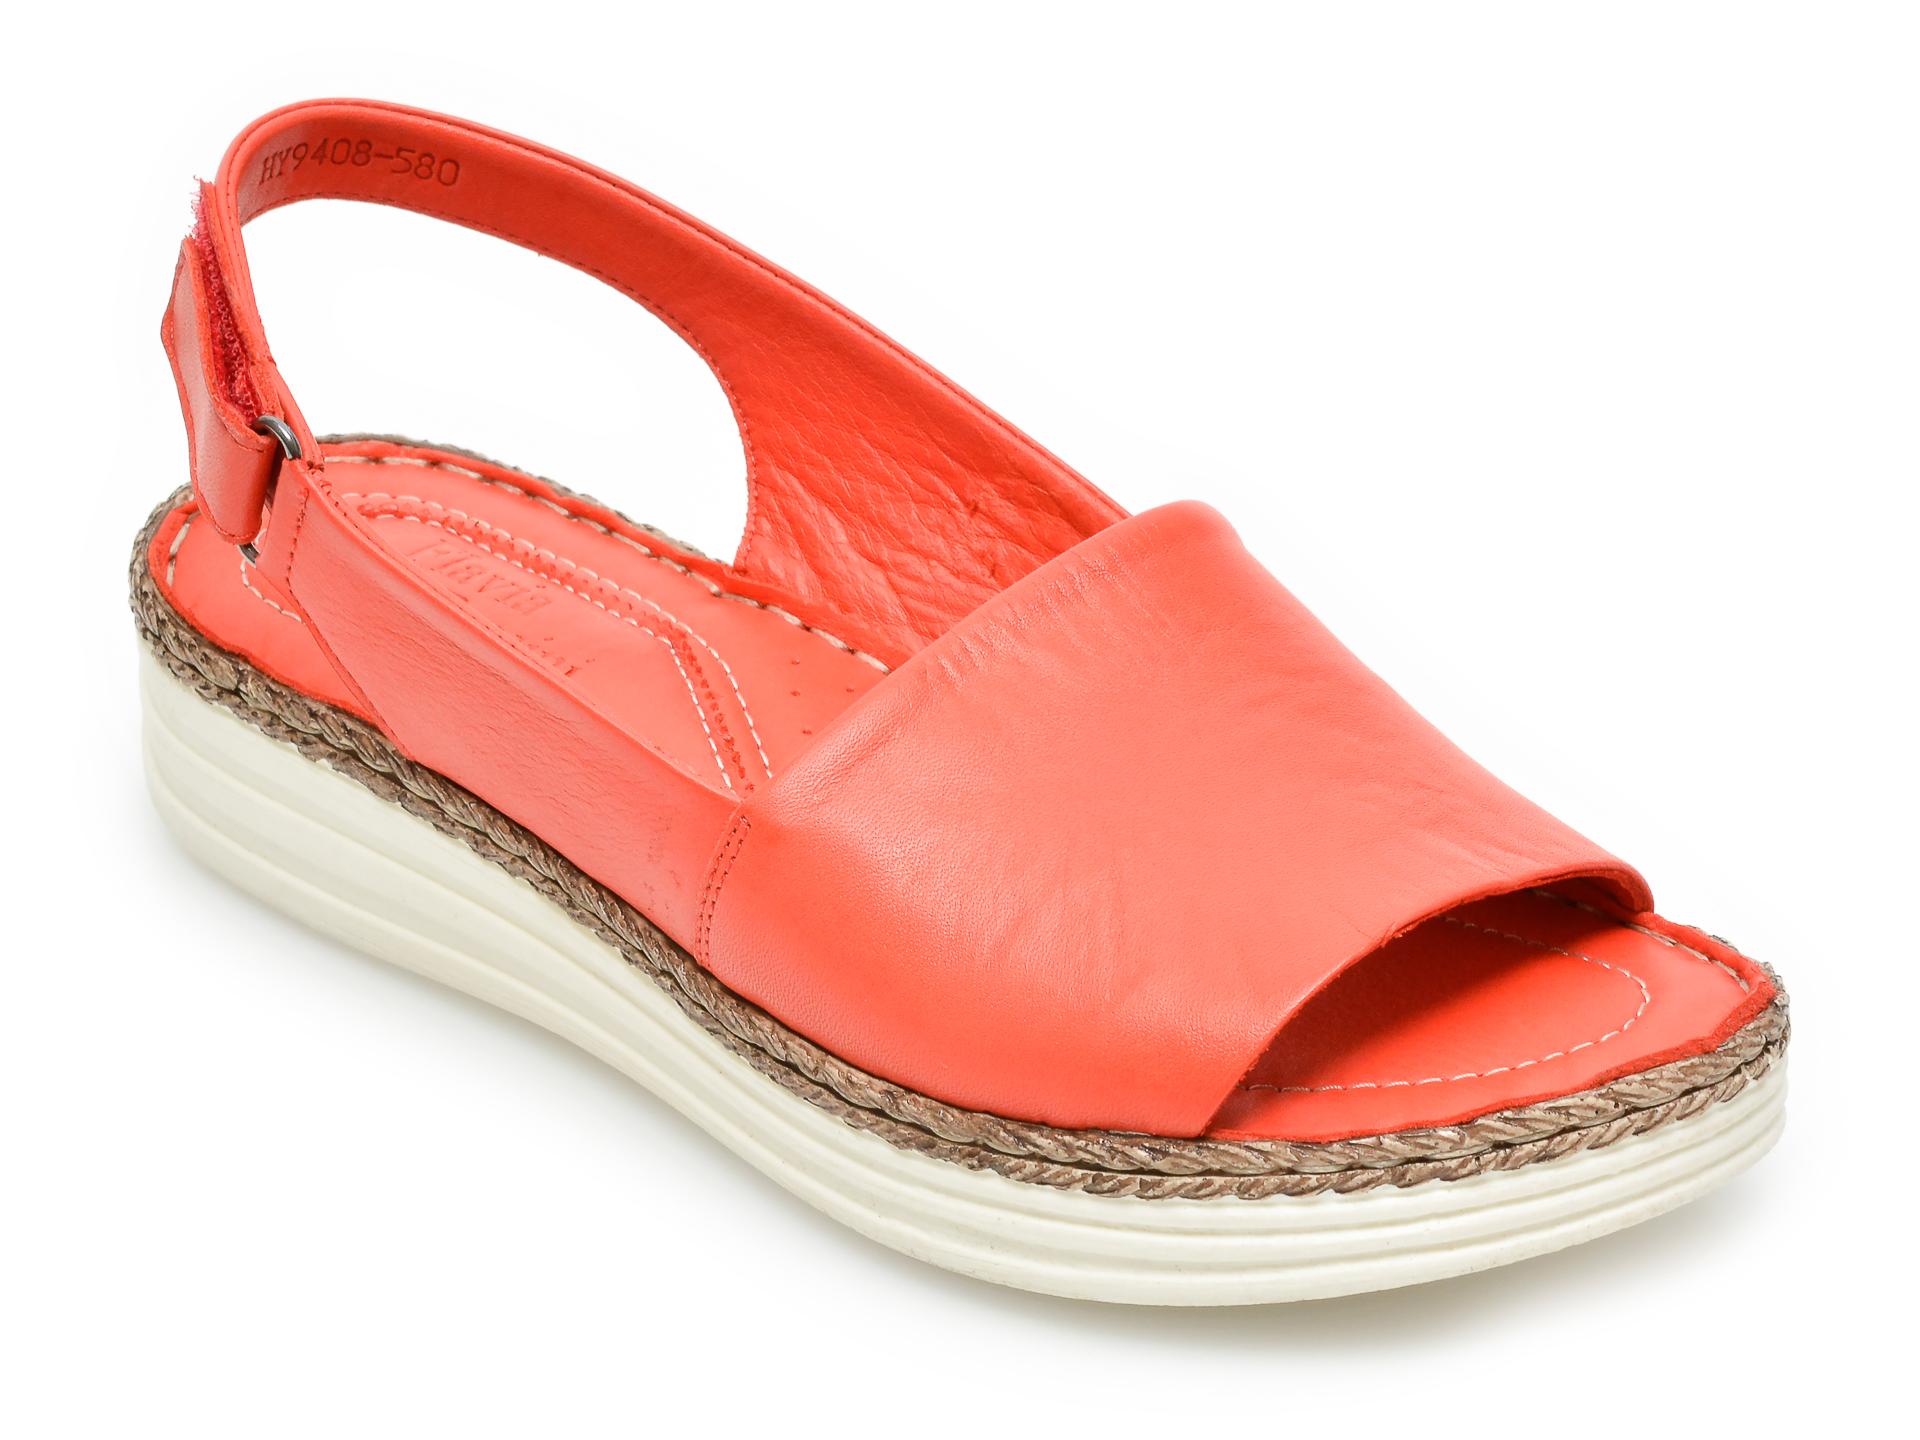 Sandale FLAVIA PASSINI rosii, 9408580, din piele naturala imagine otter.ro 2021